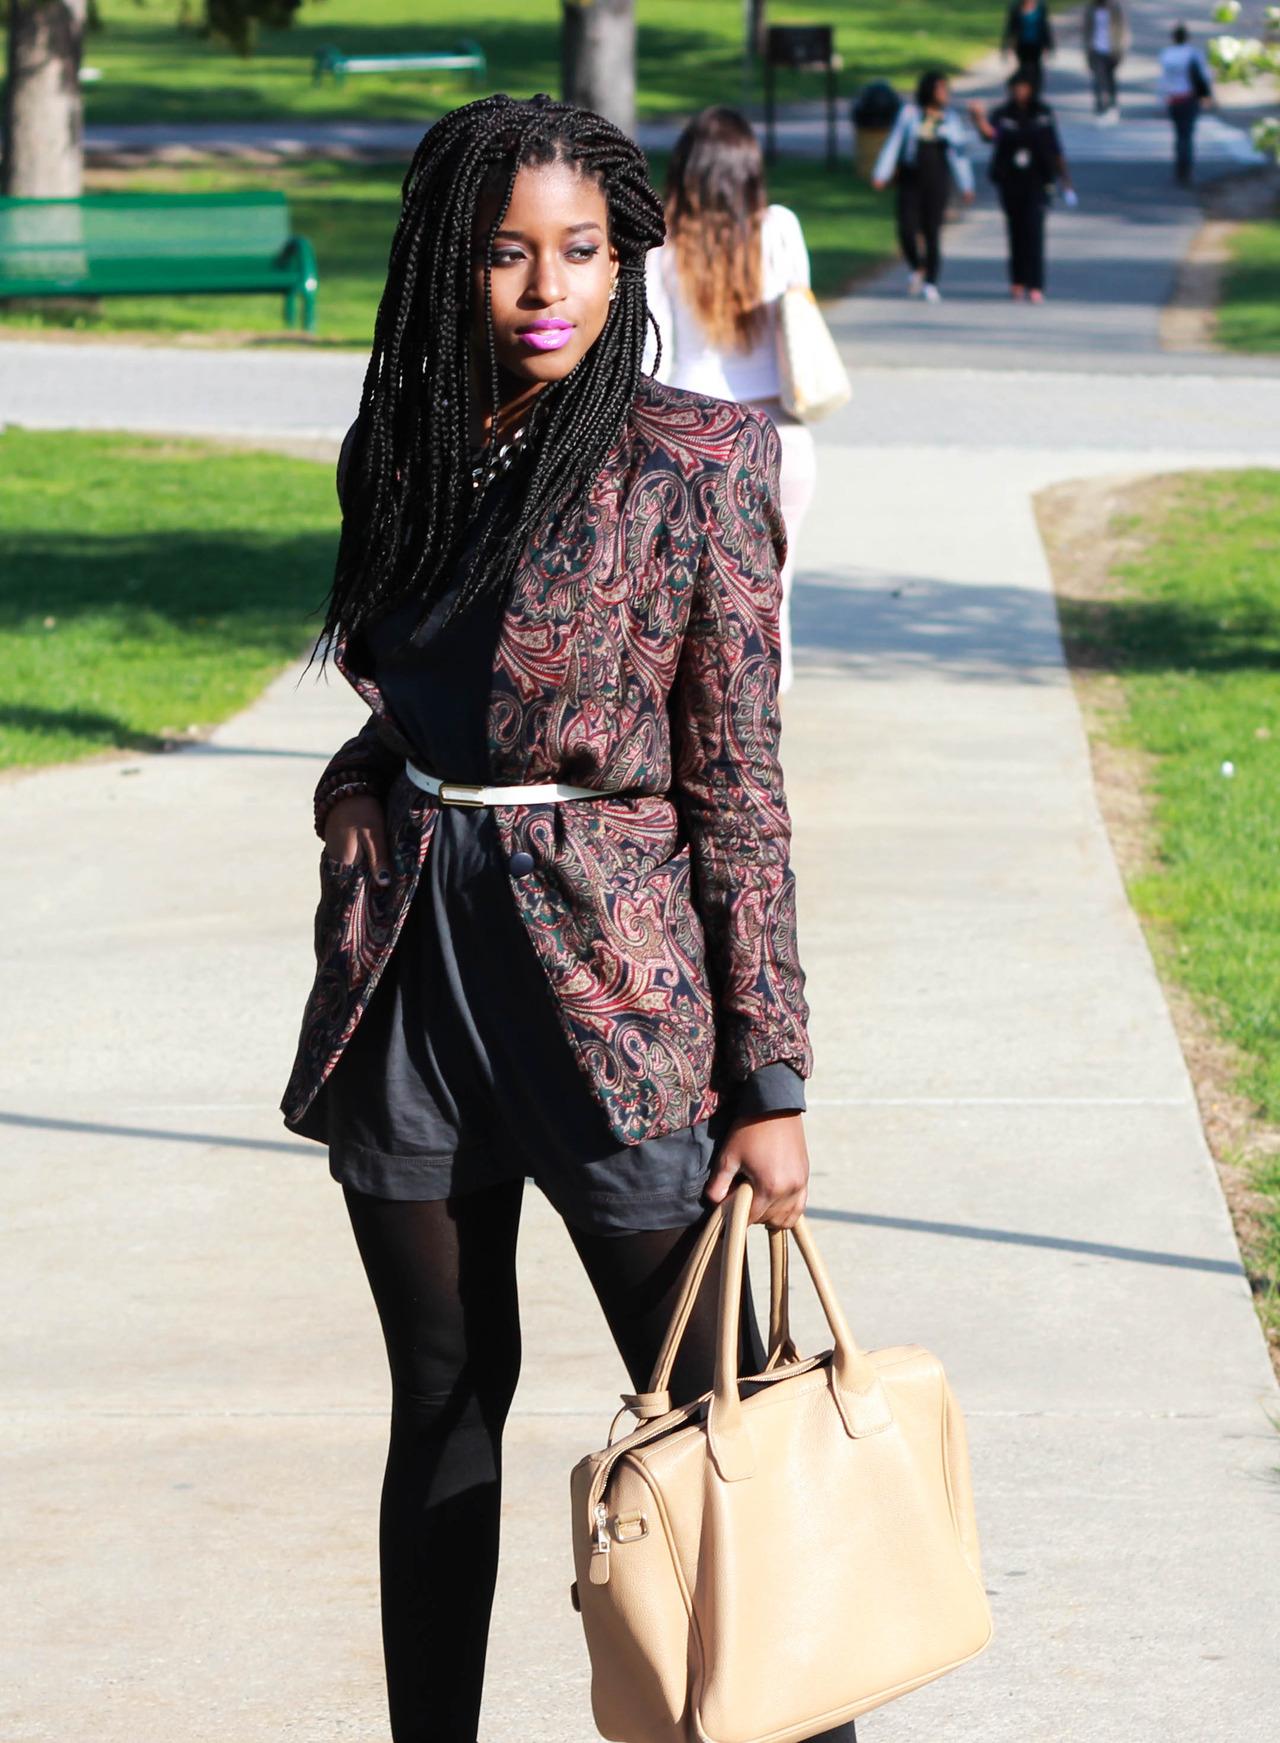 pretty classy black woman